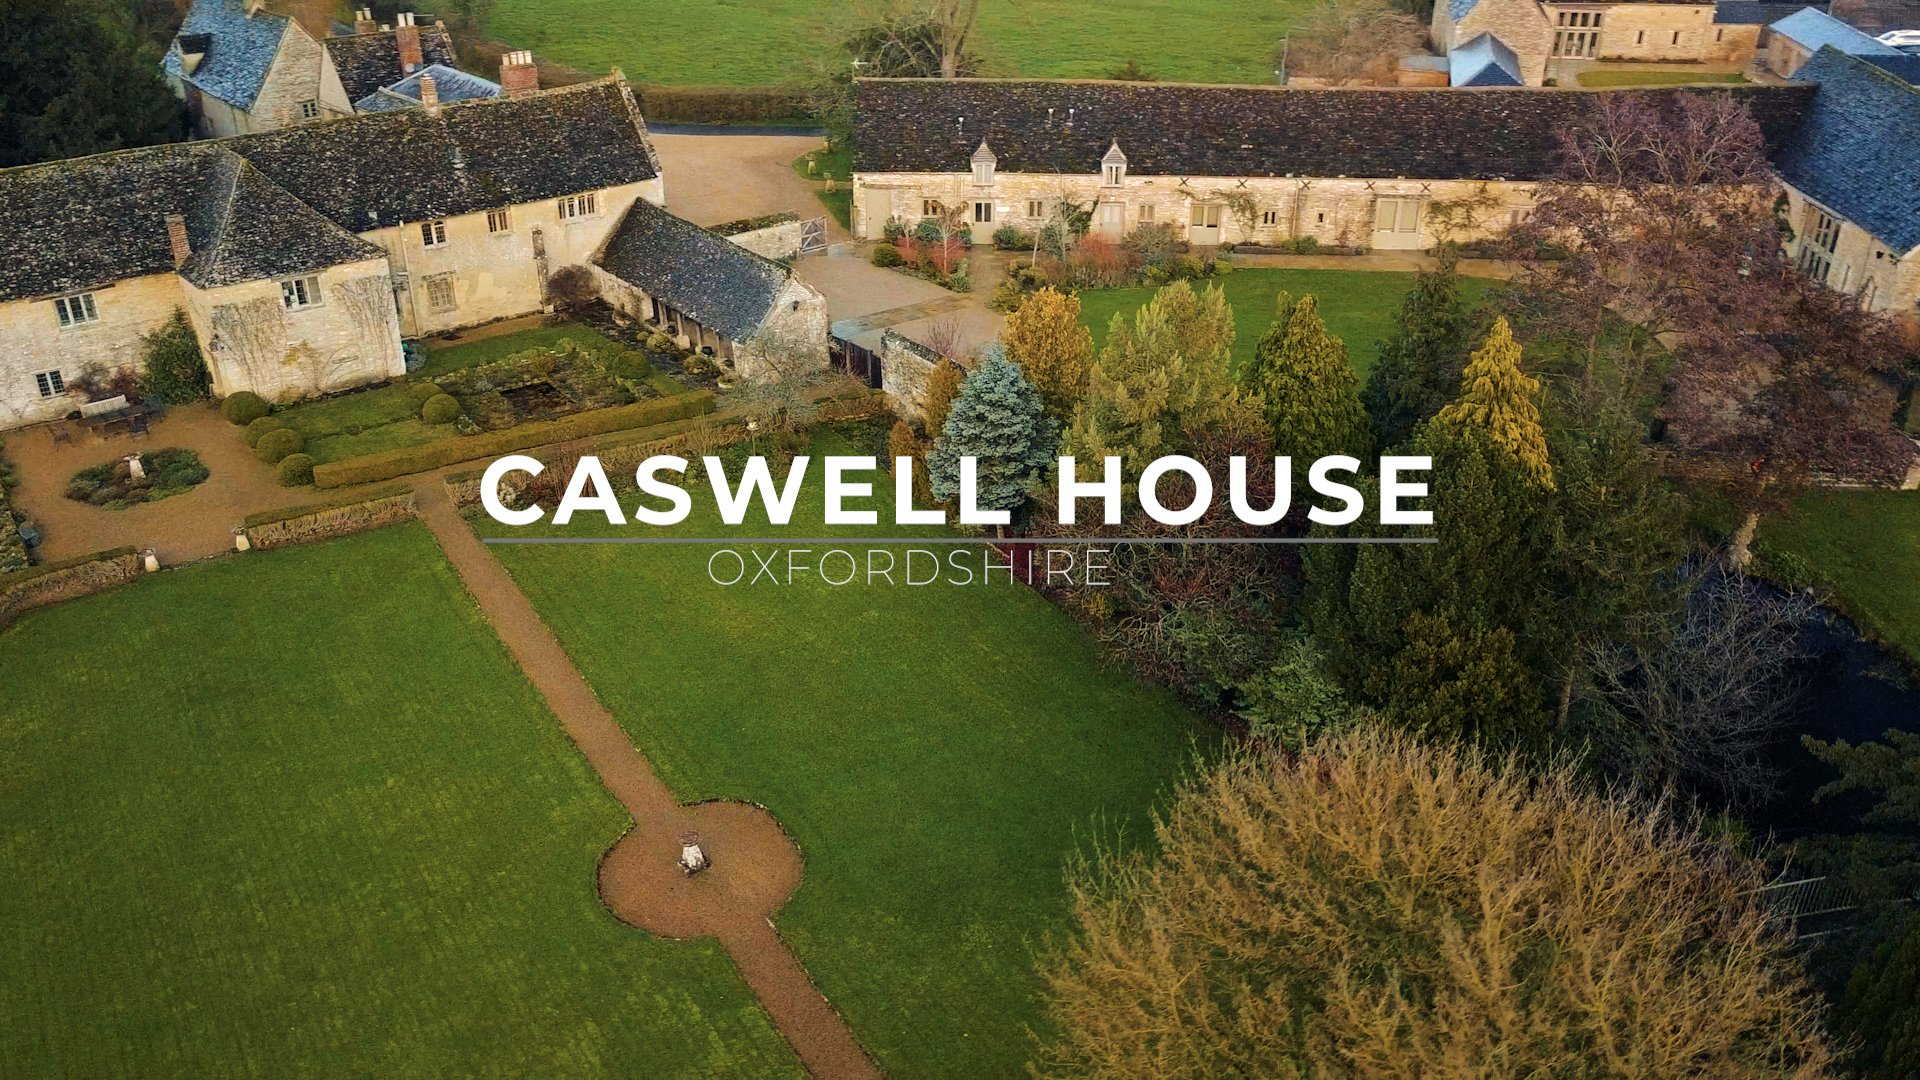 caswell house aerial shot full